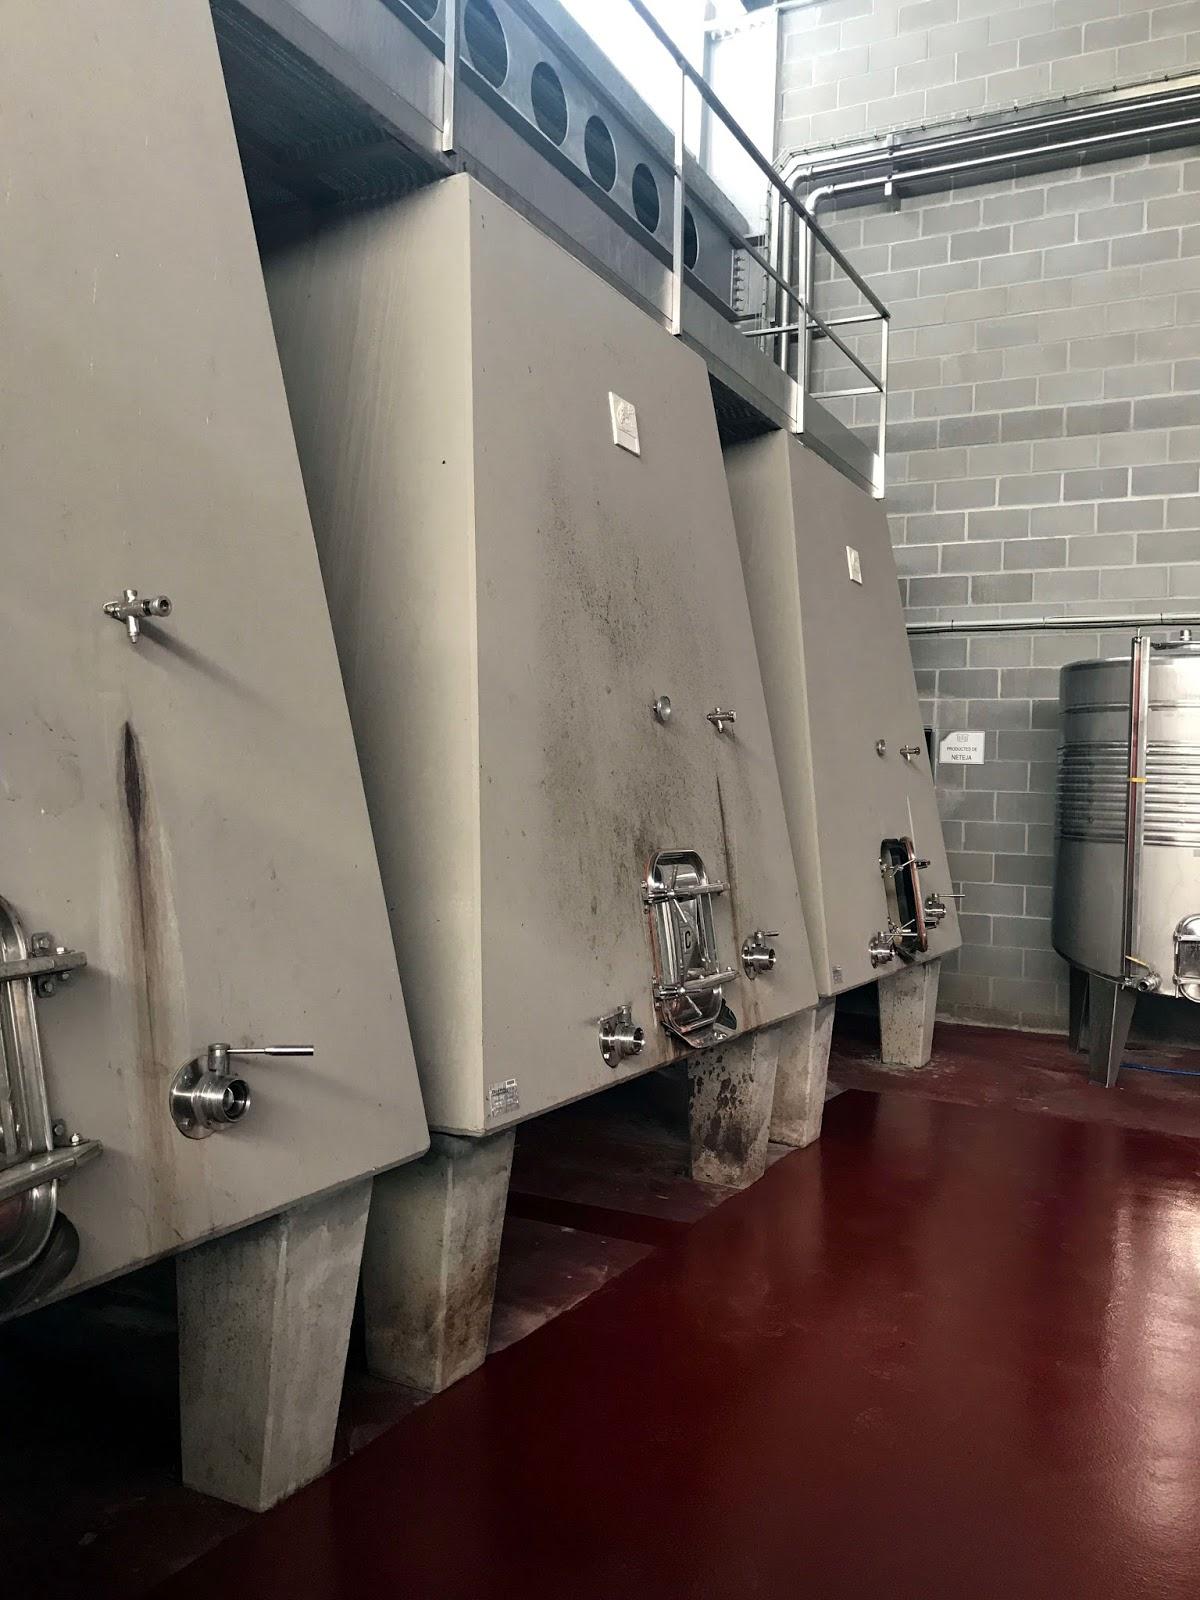 Stitch & Bear - Torres Priorat - Concrete winemaking tanks